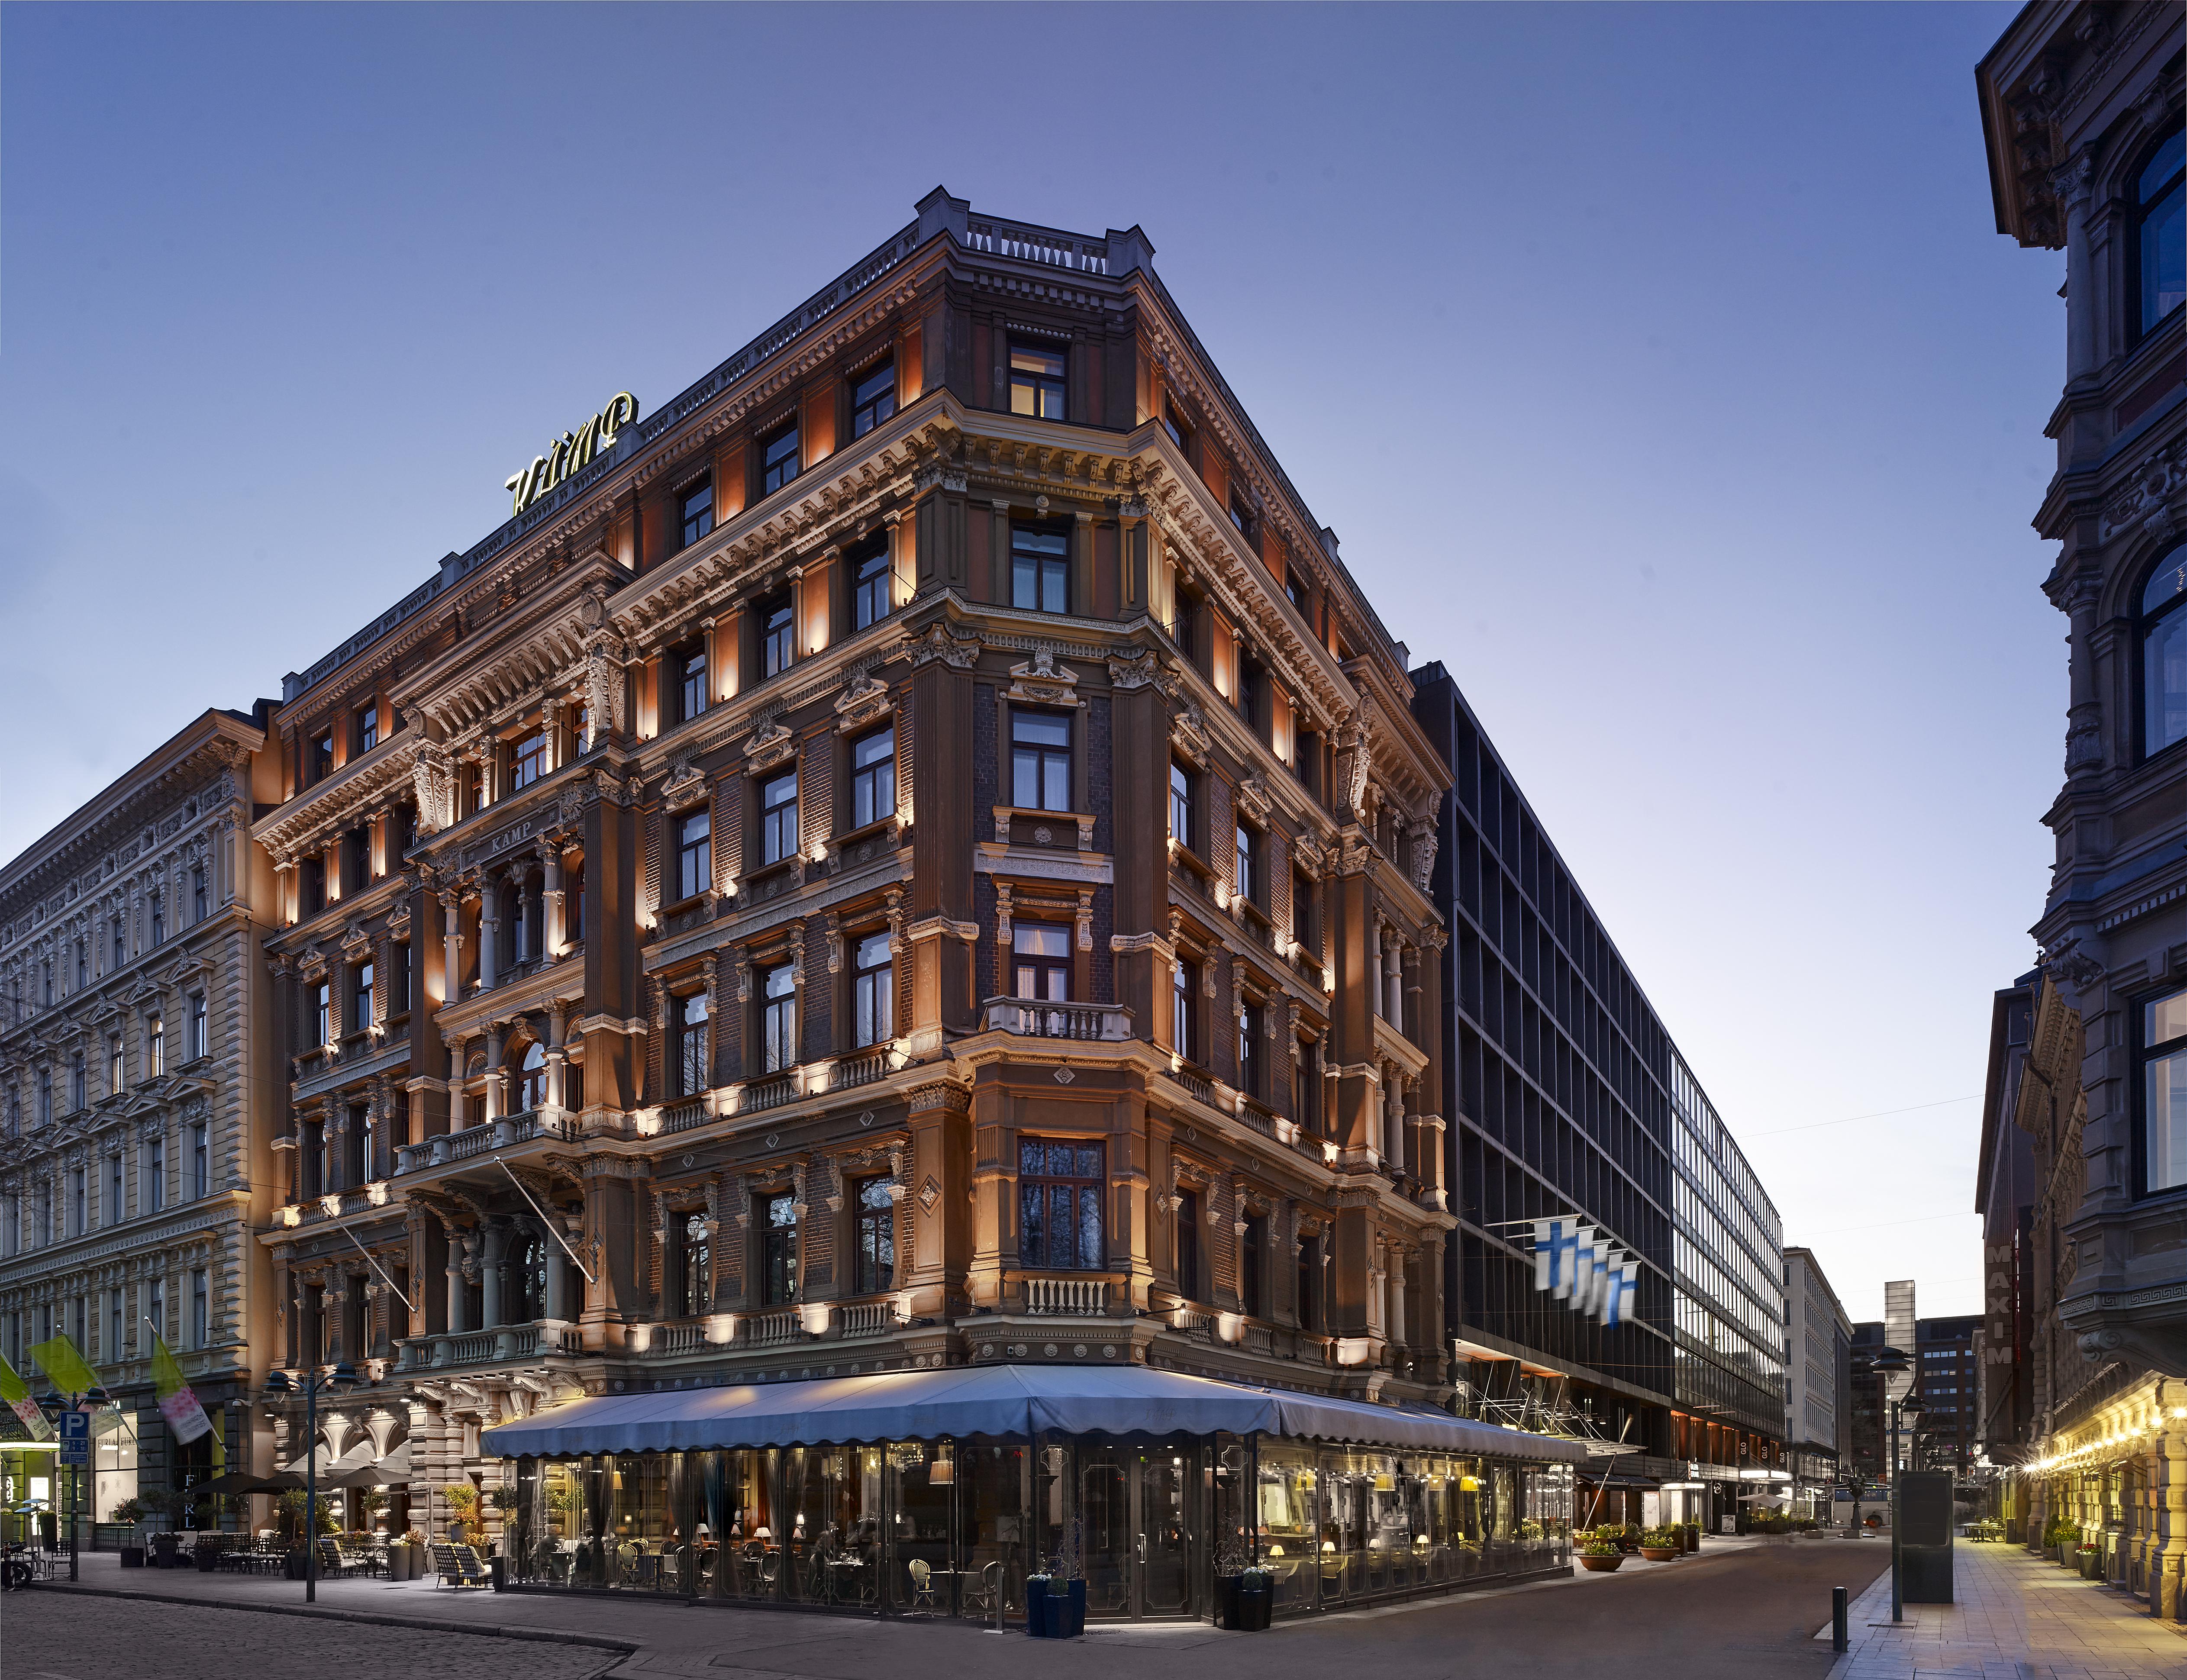 GLO Hotel Kluuvi - Hotel in Helsinki city centre  11df90391d